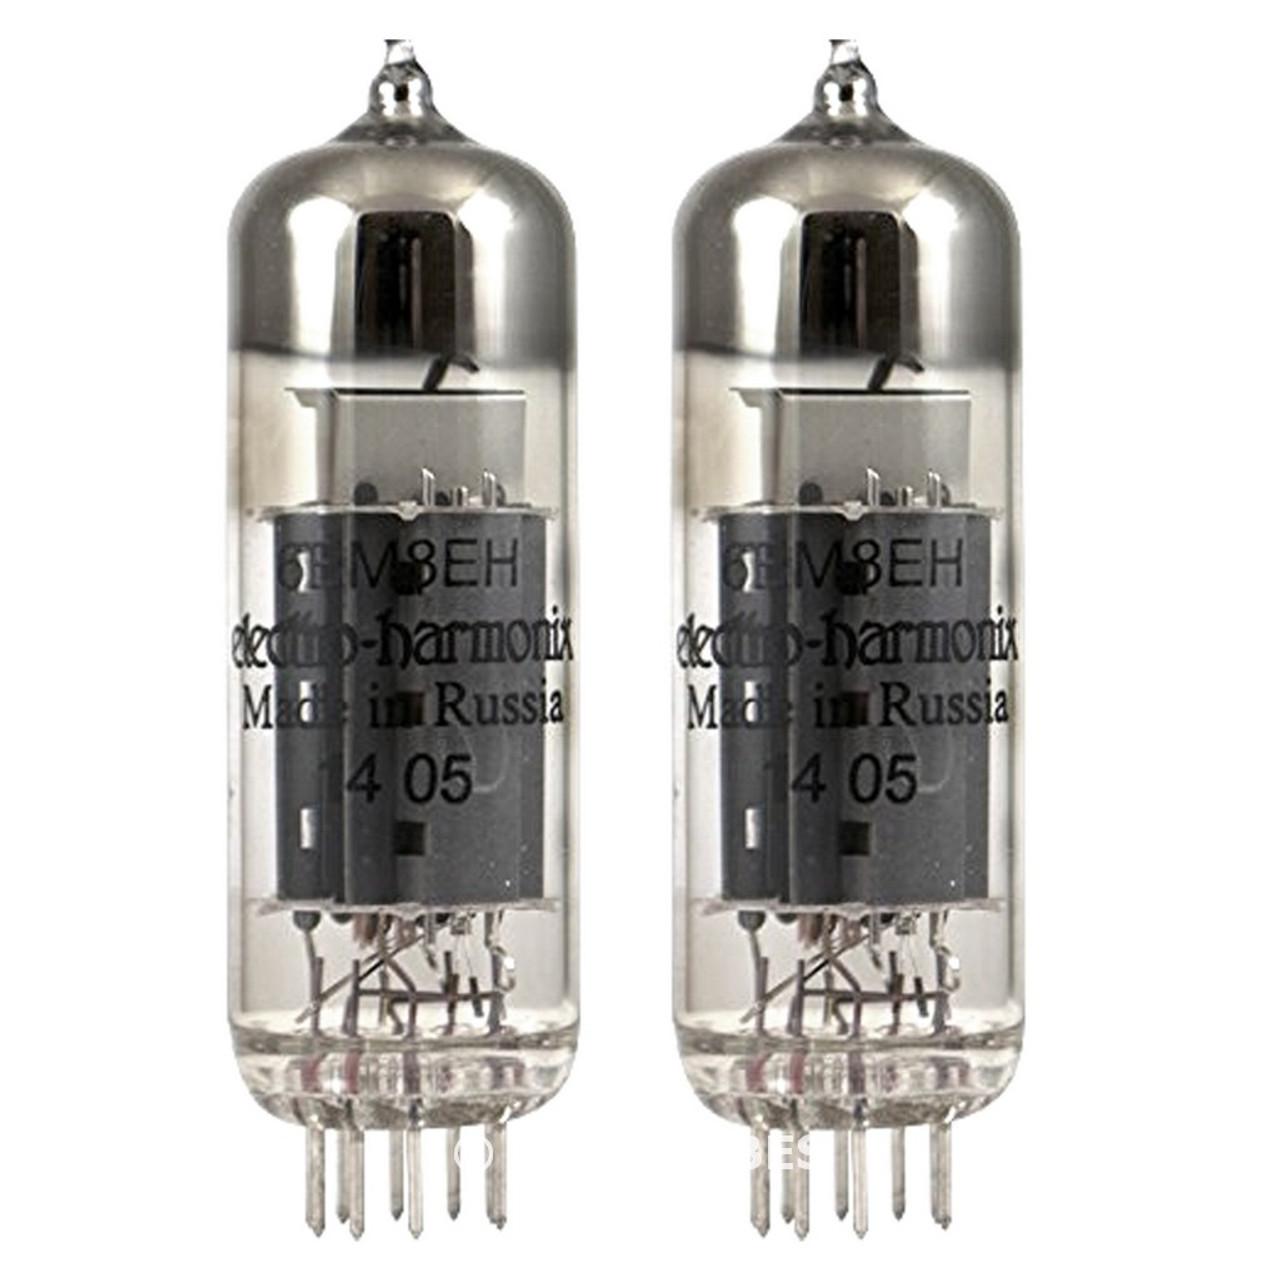 New Matched Pair (2) Electro-Harmonix 6BM8 Vacuum Tubes